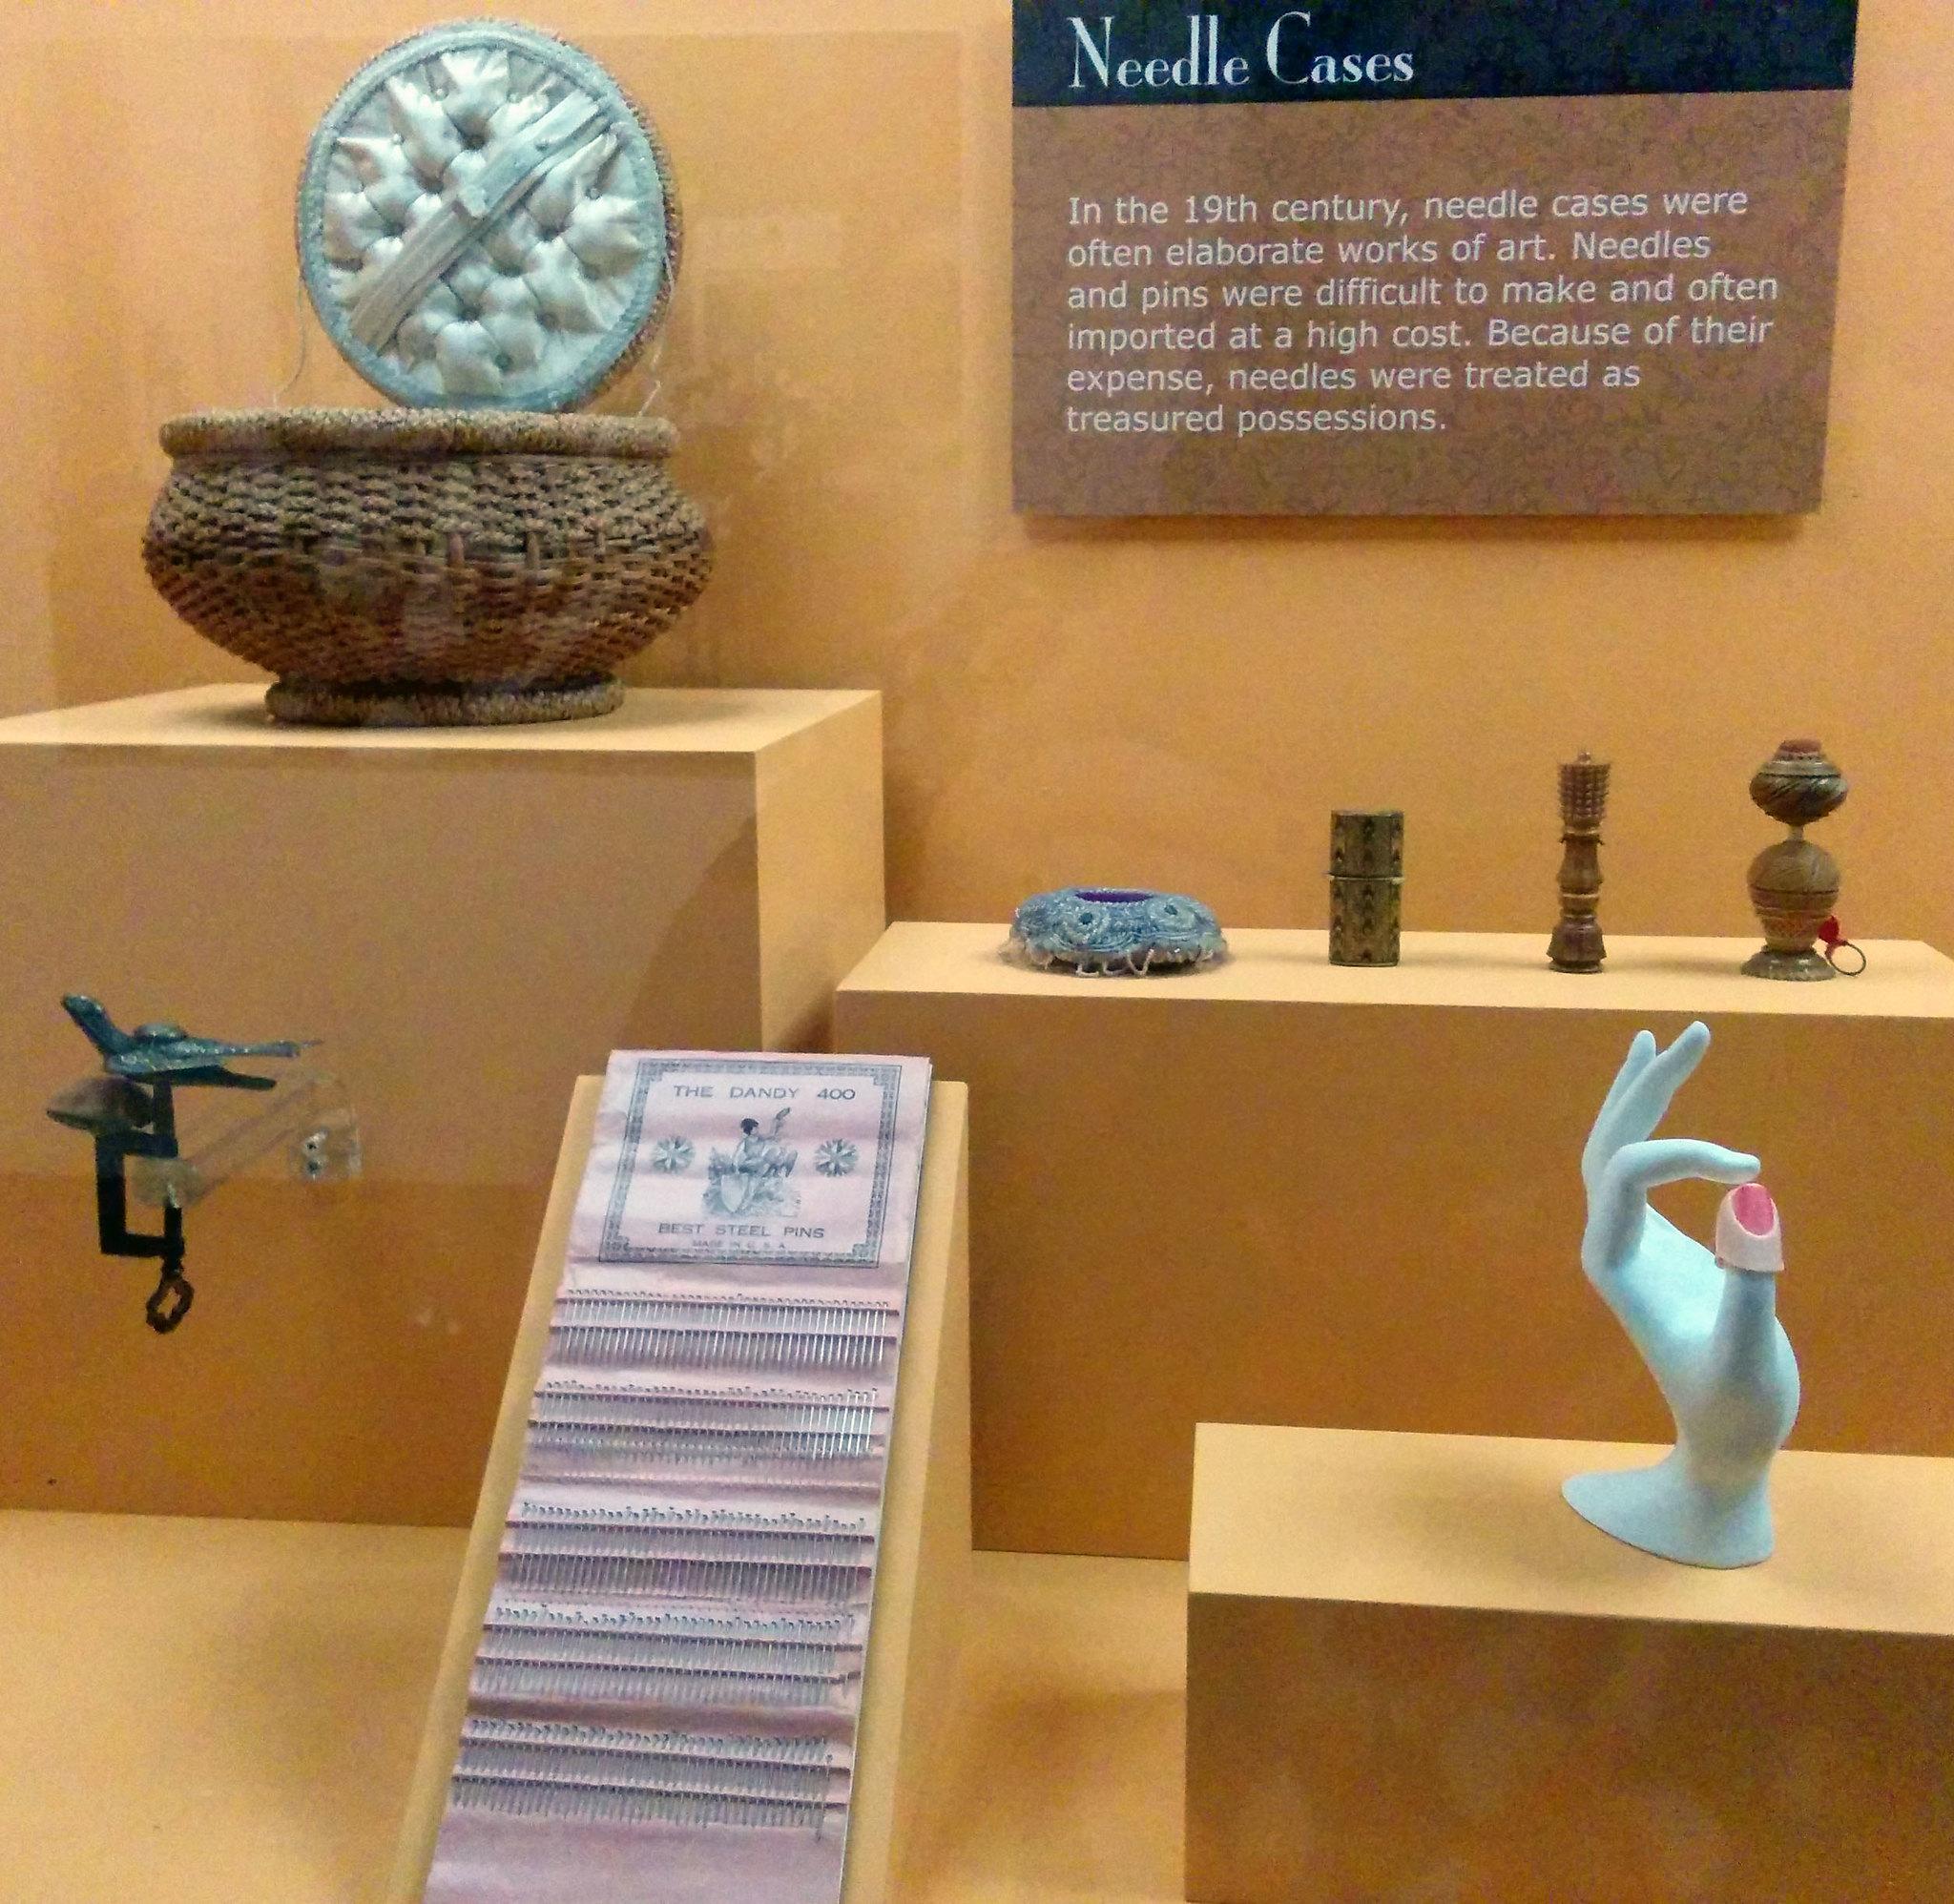 14 - 19th Century tools